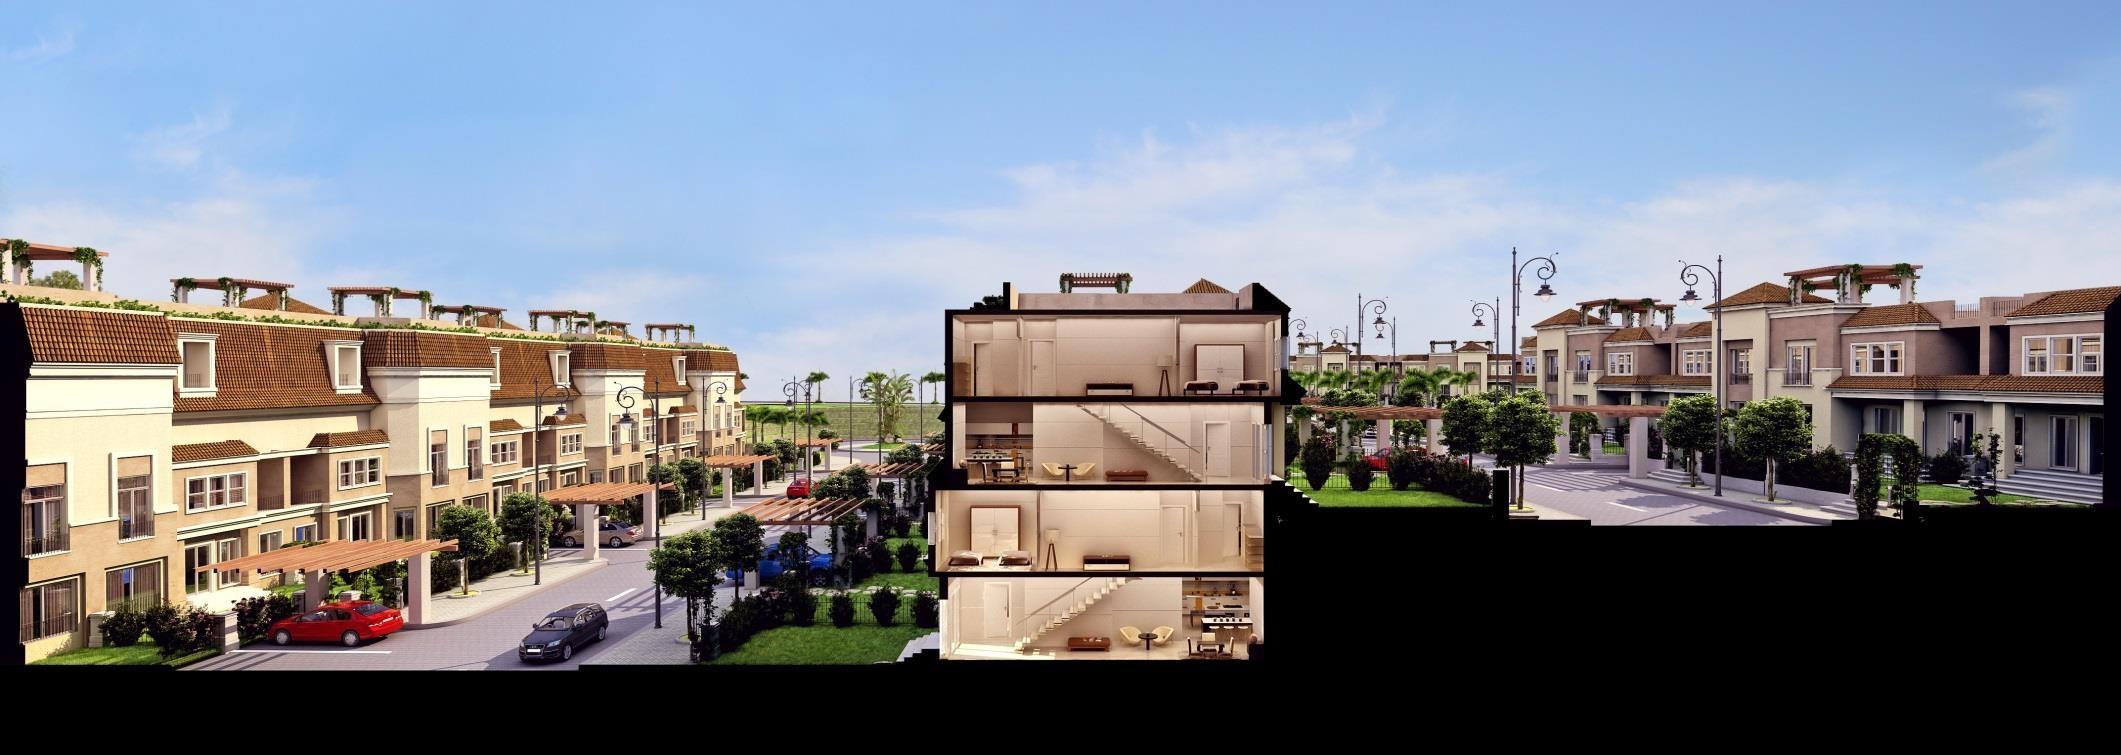 S-villa section